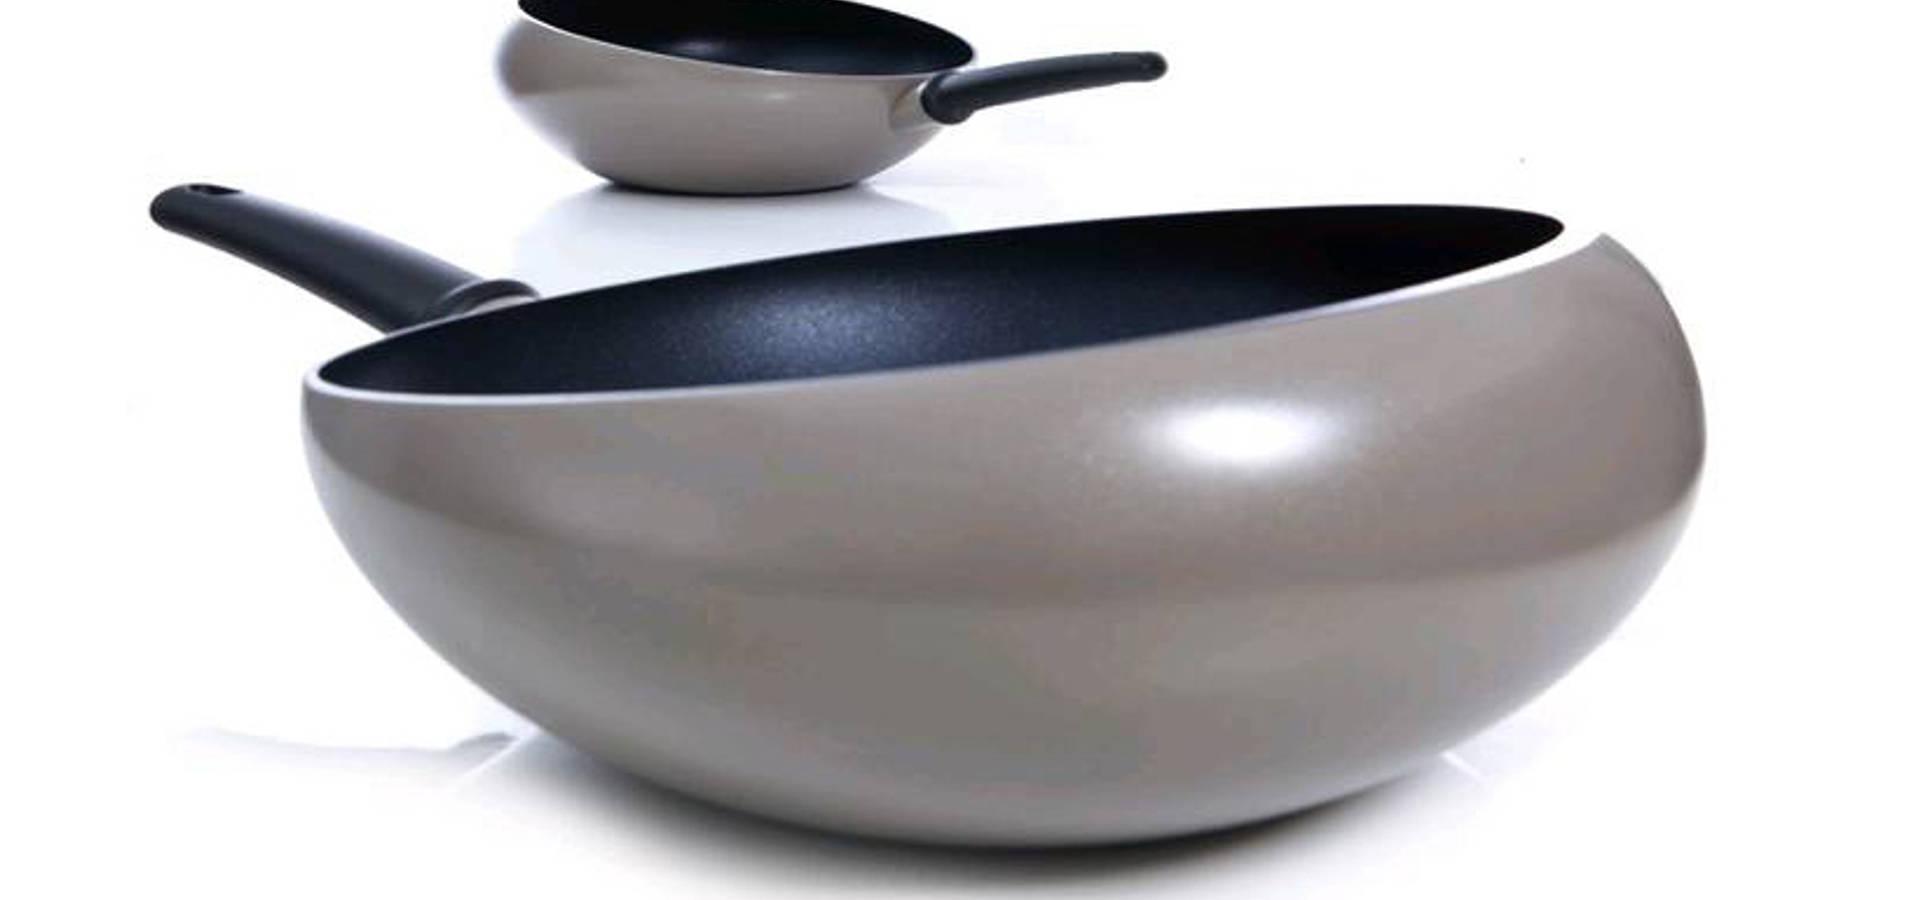 boomerang wok profesjonalista nikolai carels product. Black Bedroom Furniture Sets. Home Design Ideas